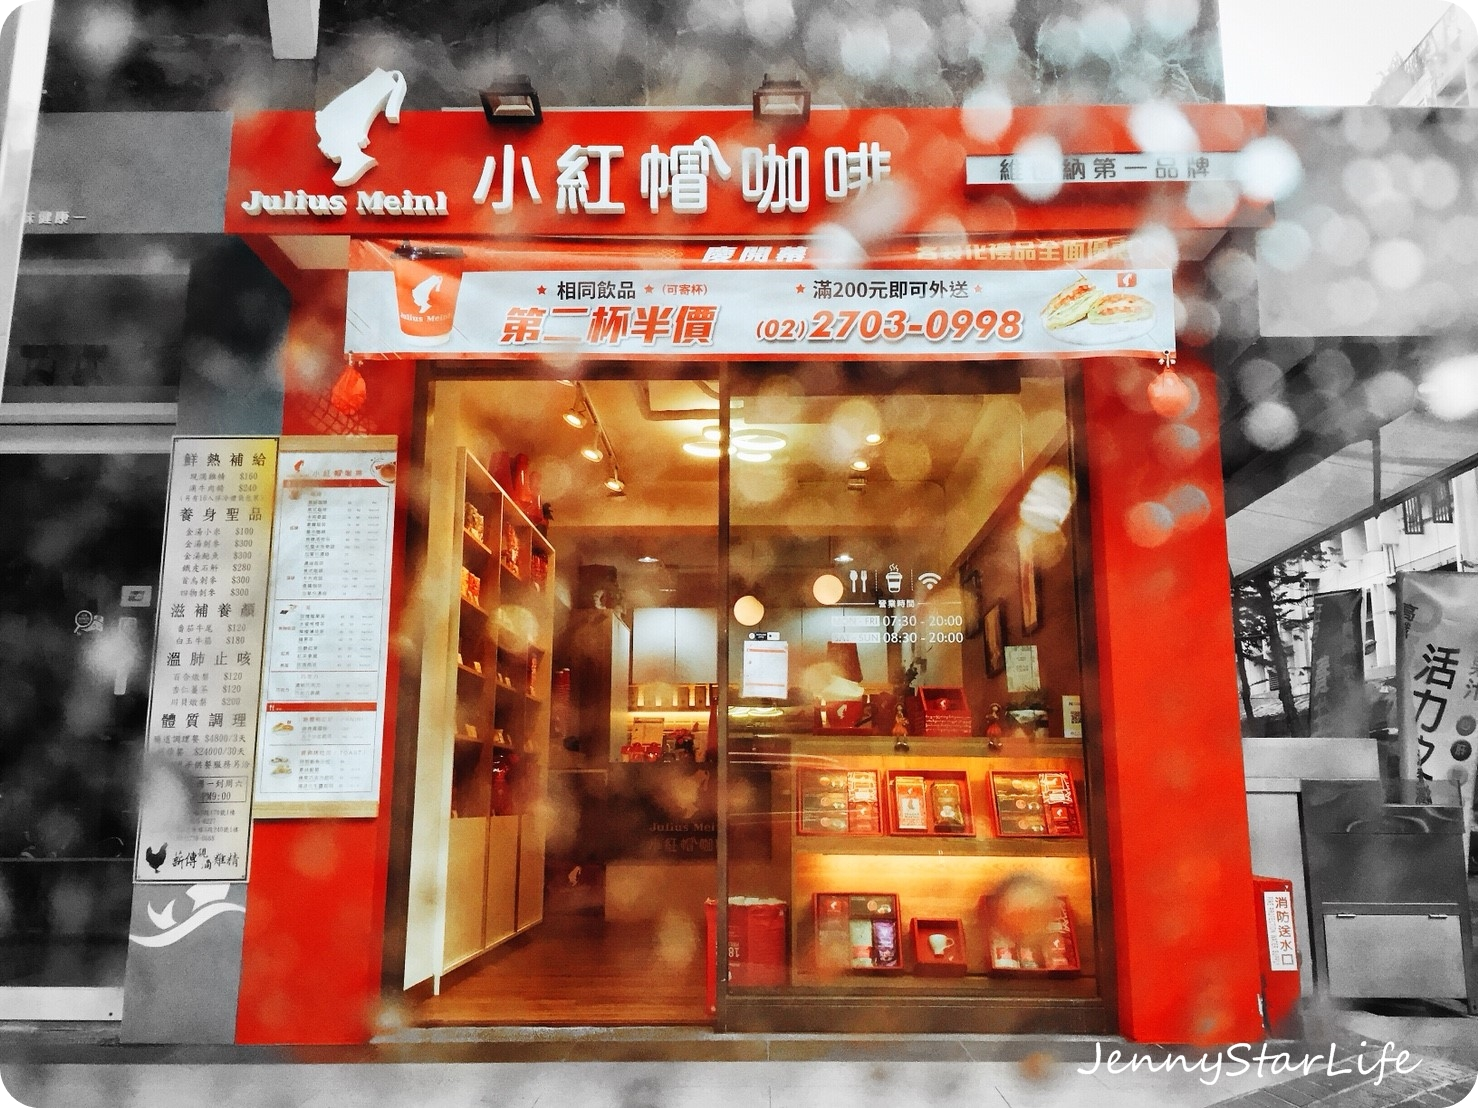 Jenny Star ♥ let's fall in love. 思緒太空 : 【食記】臺北大安區小紅帽咖啡 推薦 Julius Meinl 奧地利咖啡專賣 咖啡 ...